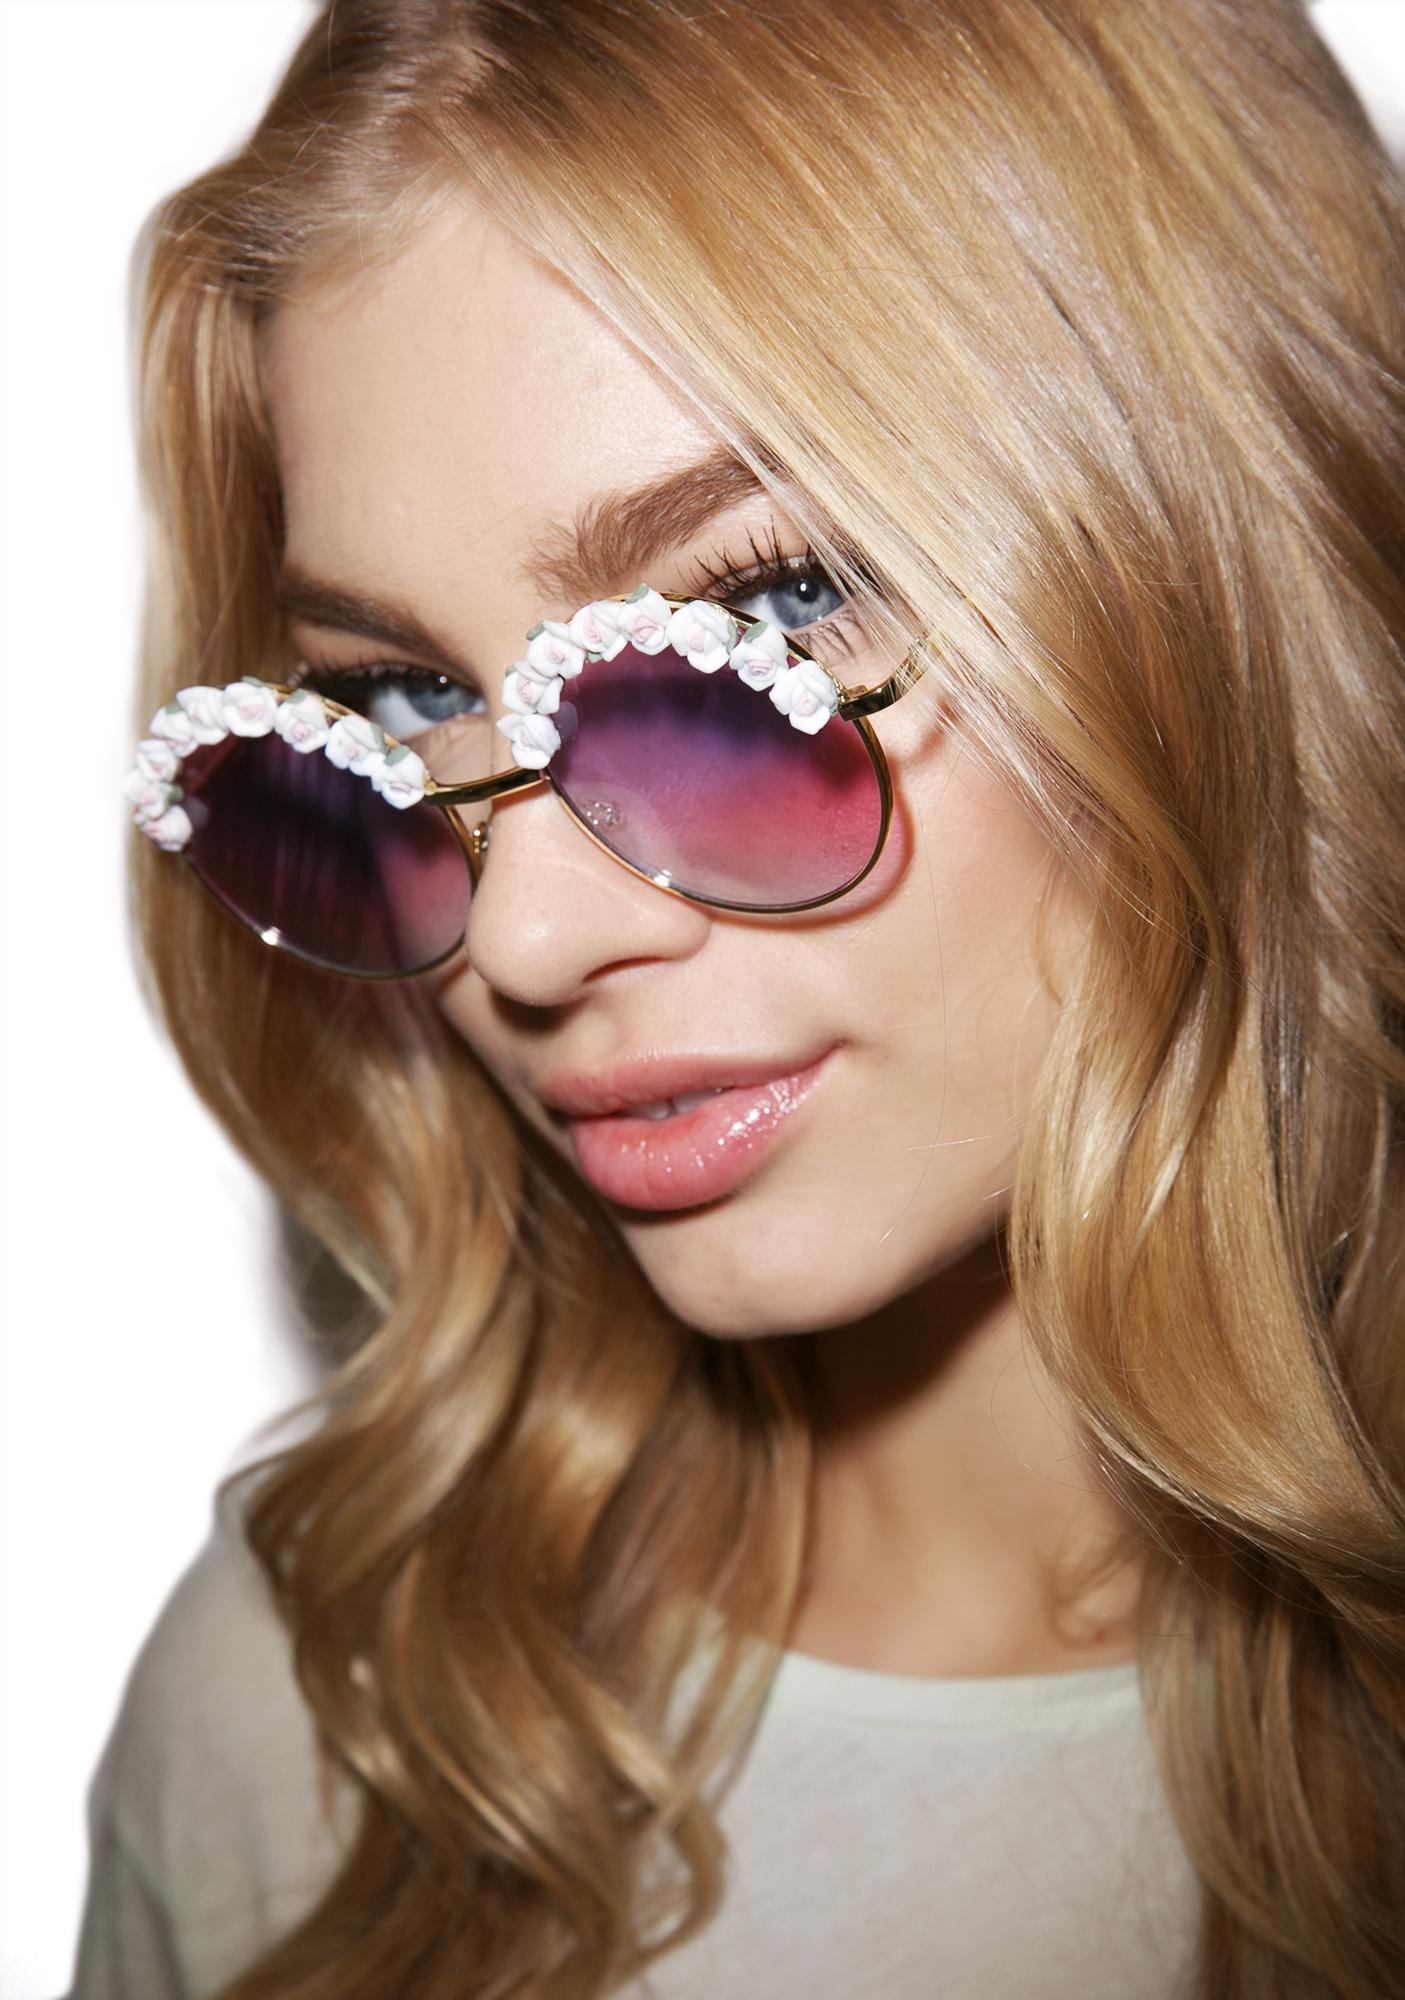 Tnemnroda Botanica Romantique Sunglasses